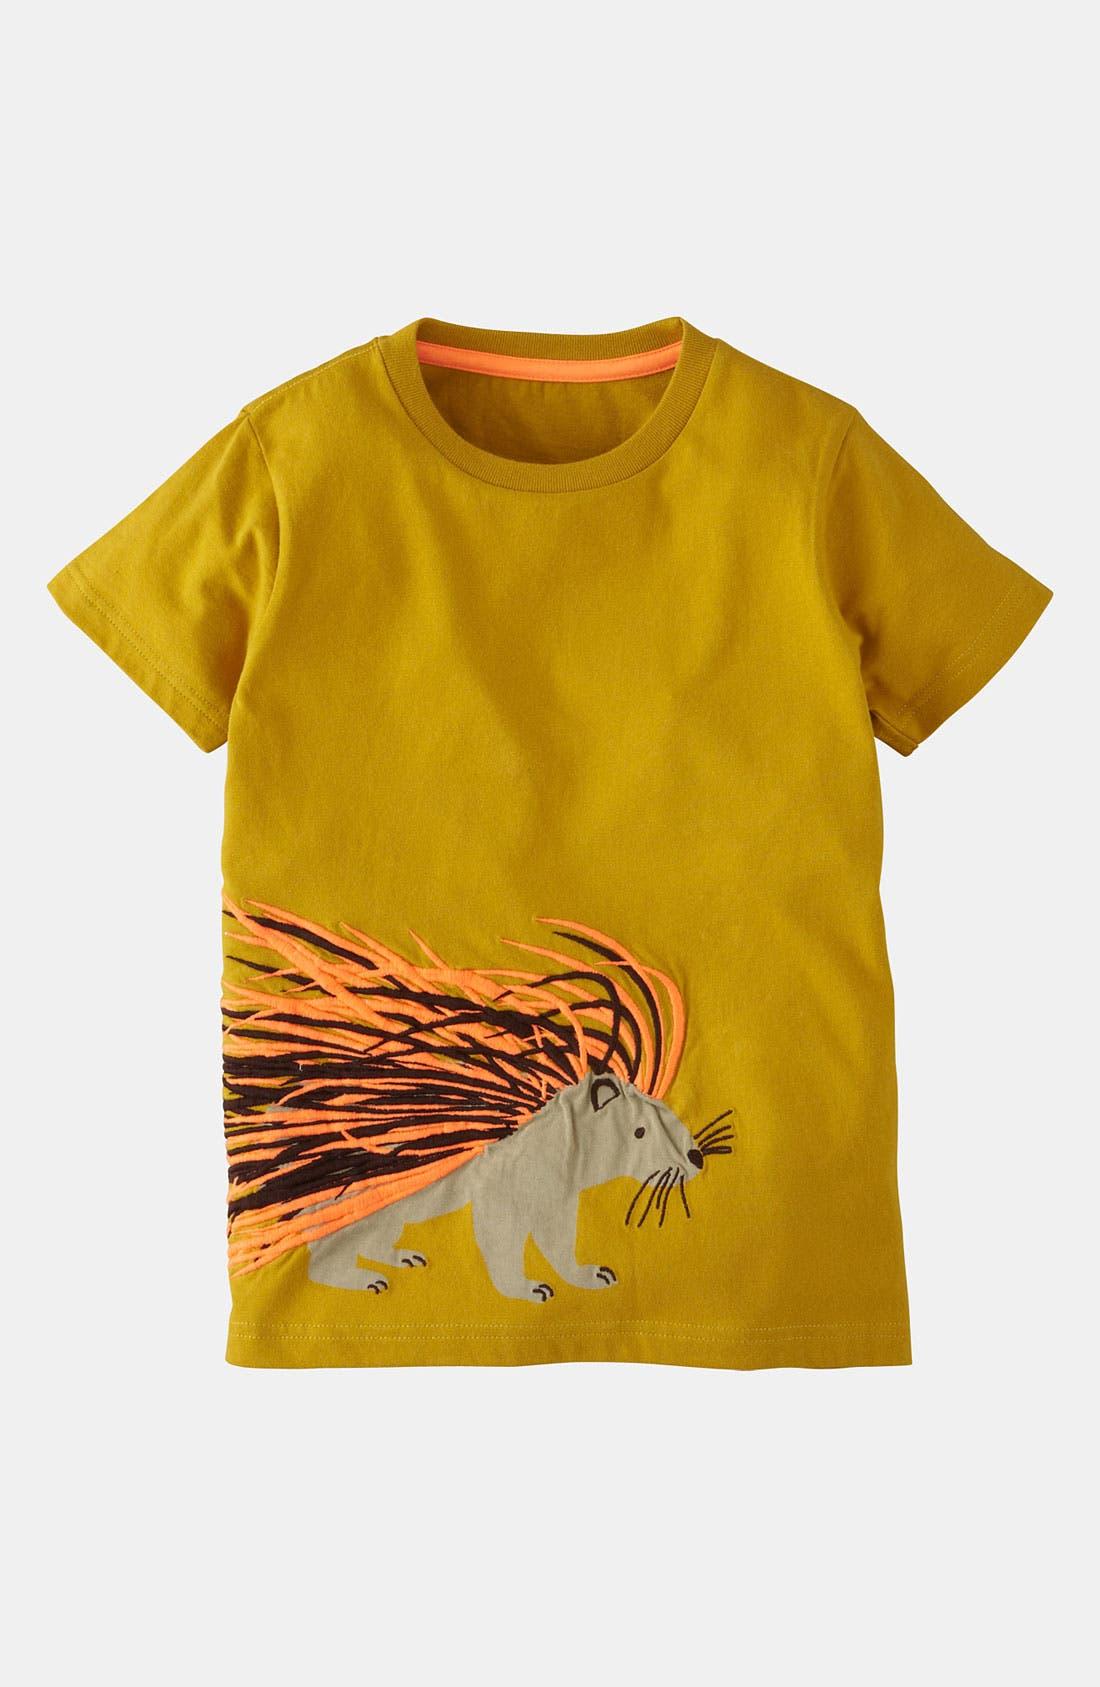 Main Image - Mini Boden 'Print & Stitch' T-Shirt (Little Boys & Big Boys)